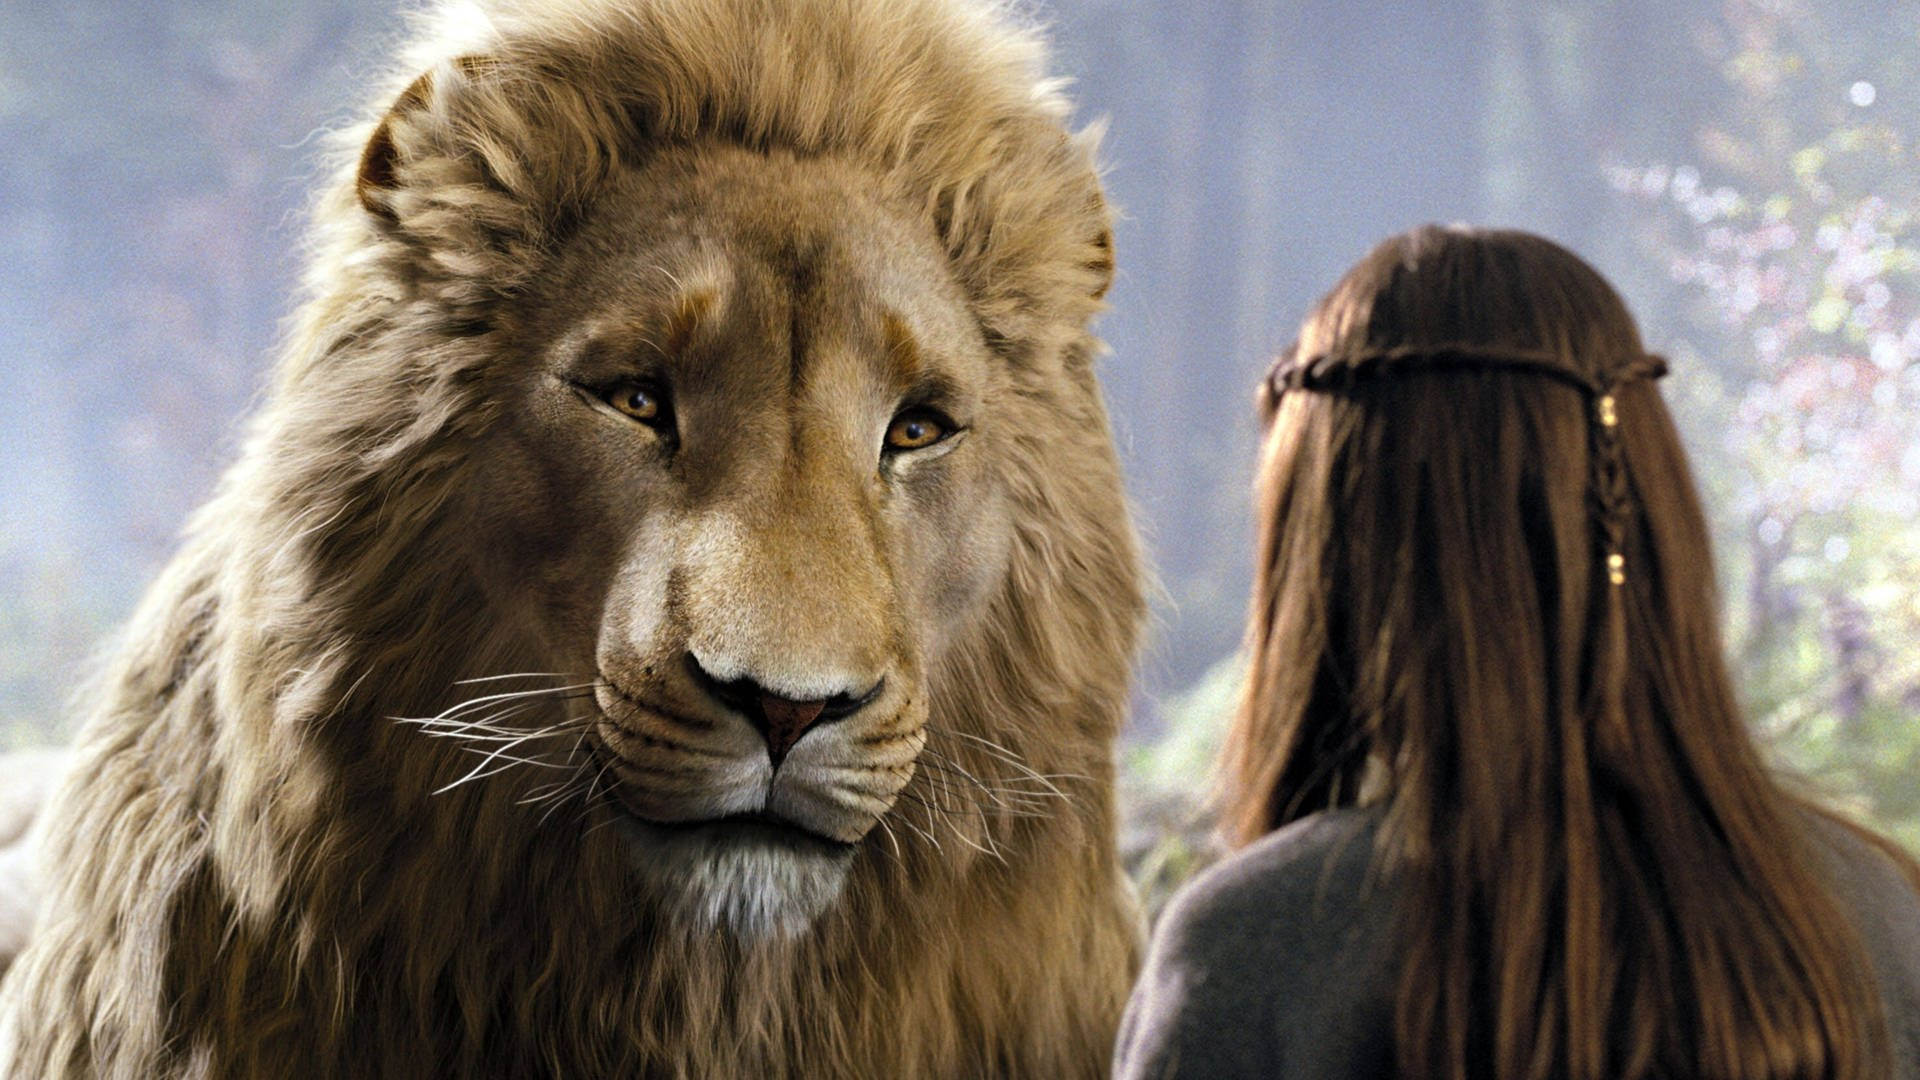 Likn König naied Mädchen